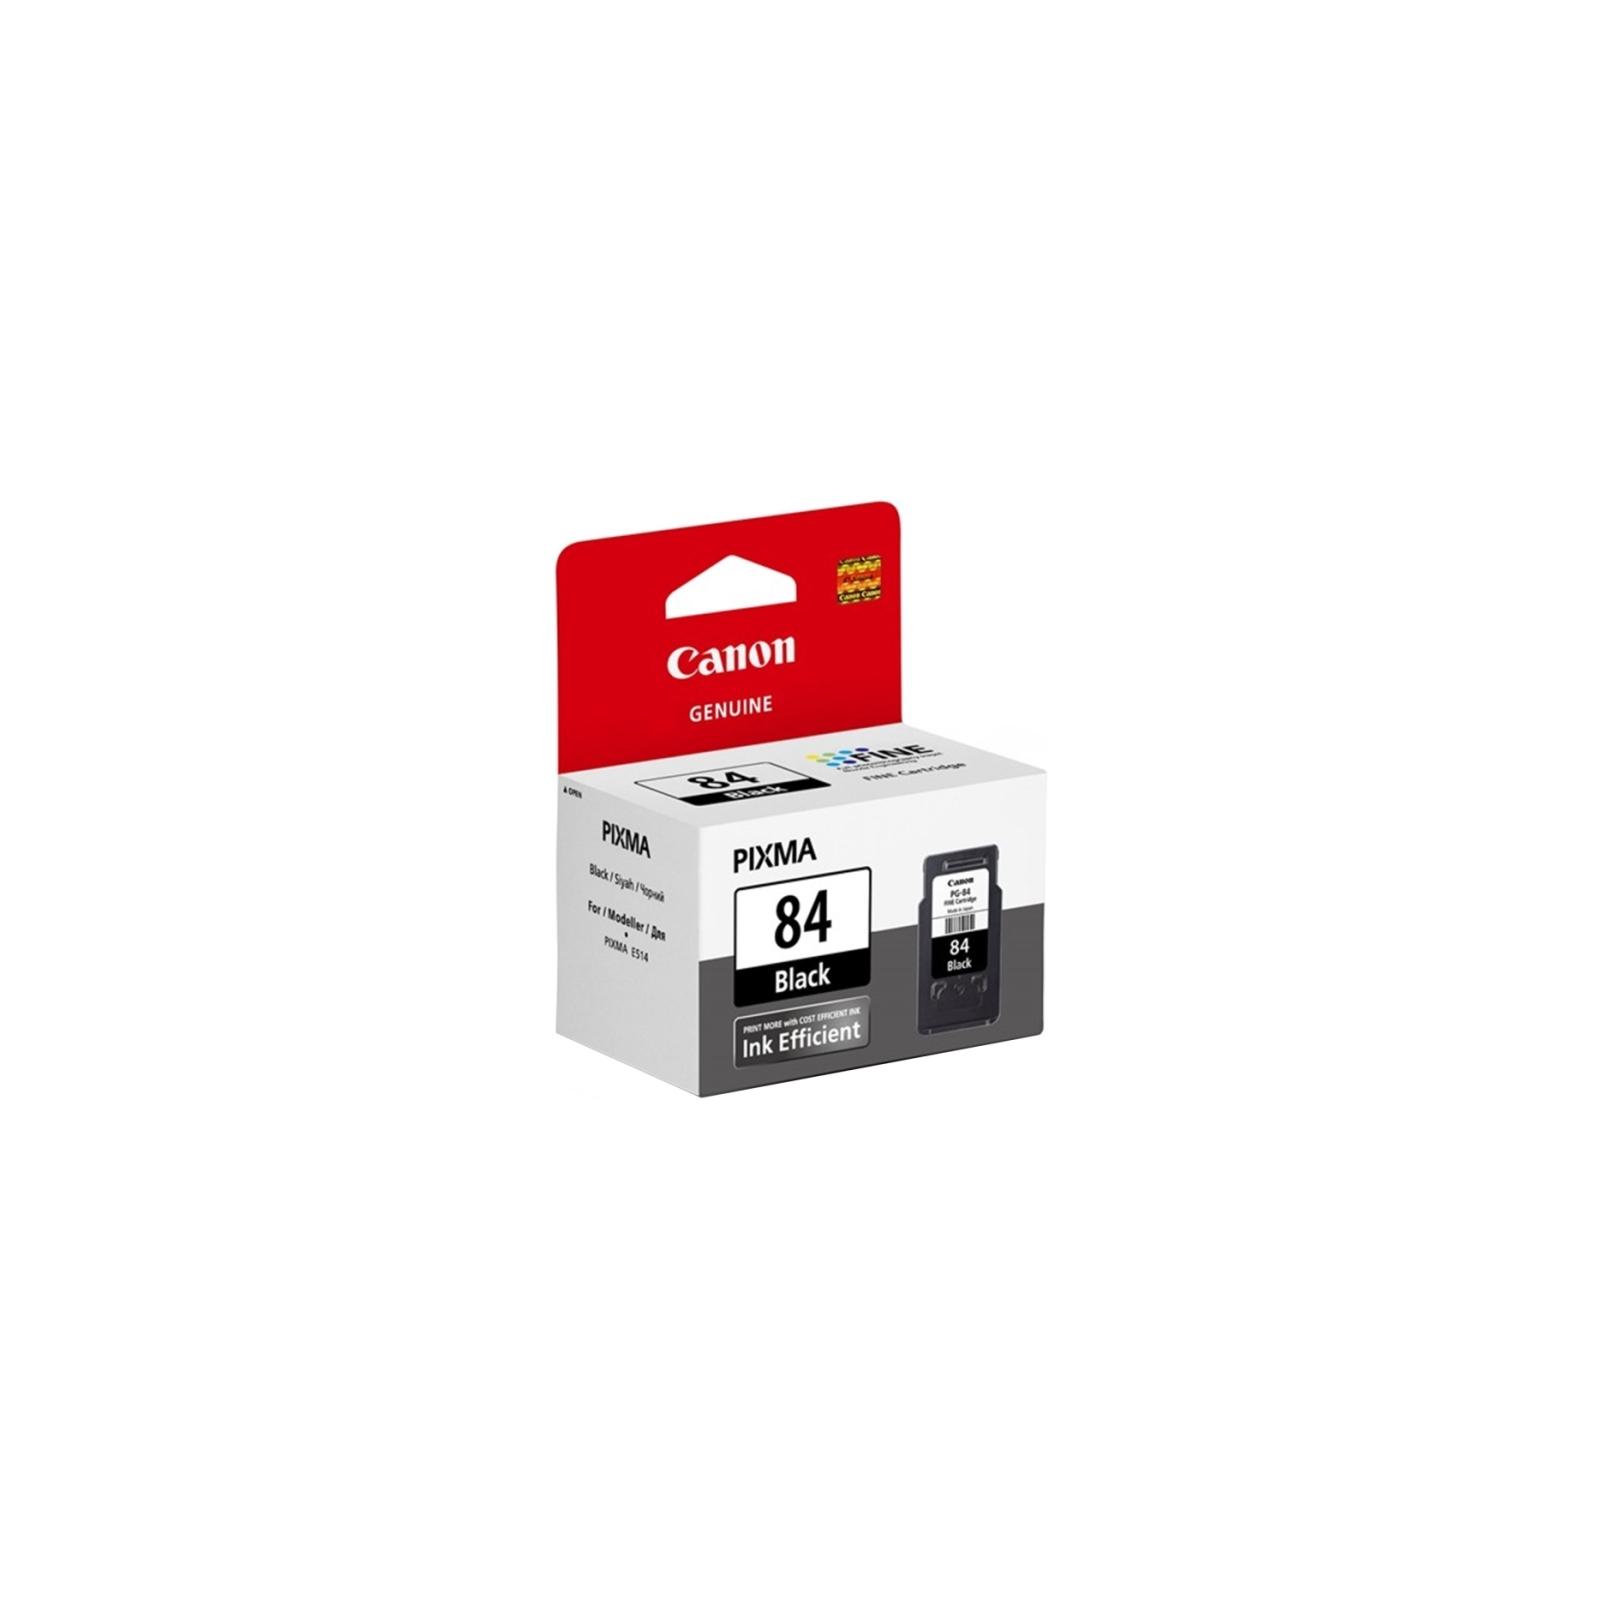 Картридж Canon PG-84 Black (8592B001) изображение 2